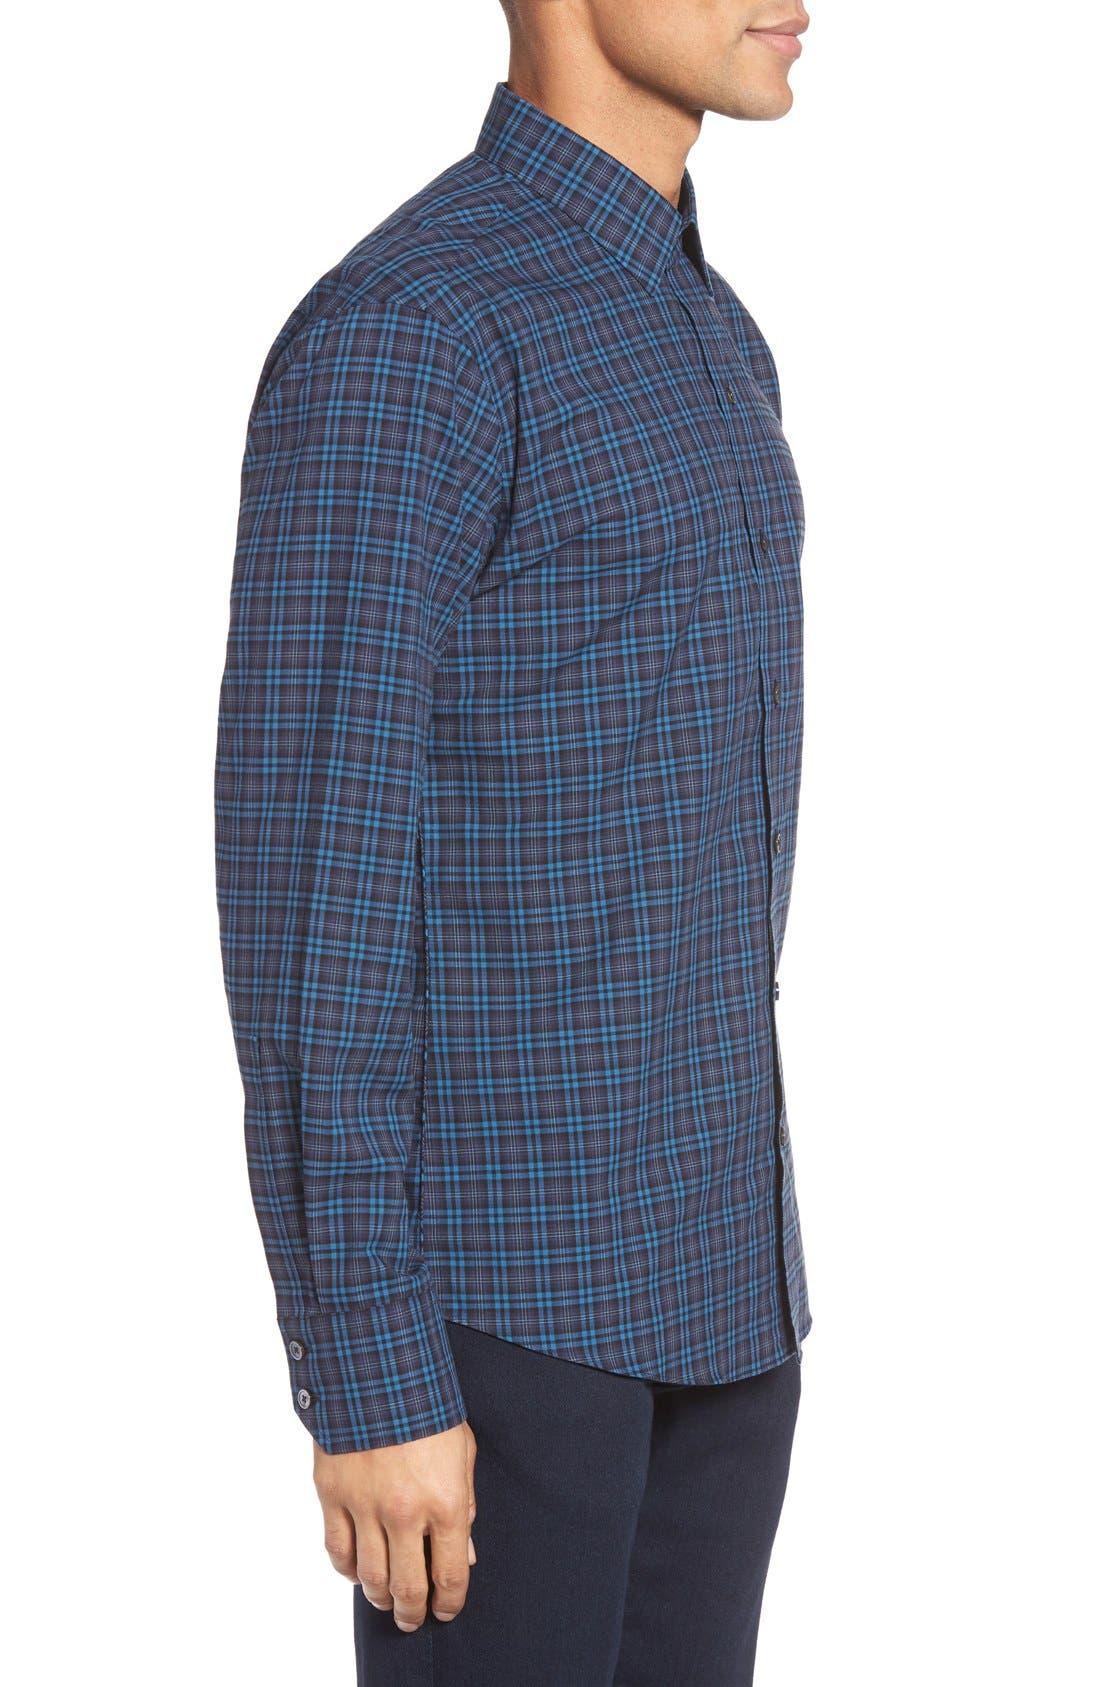 Alternate Image 3  - Zachary Prell Adler Trim Fit Plaid Sport Shirt